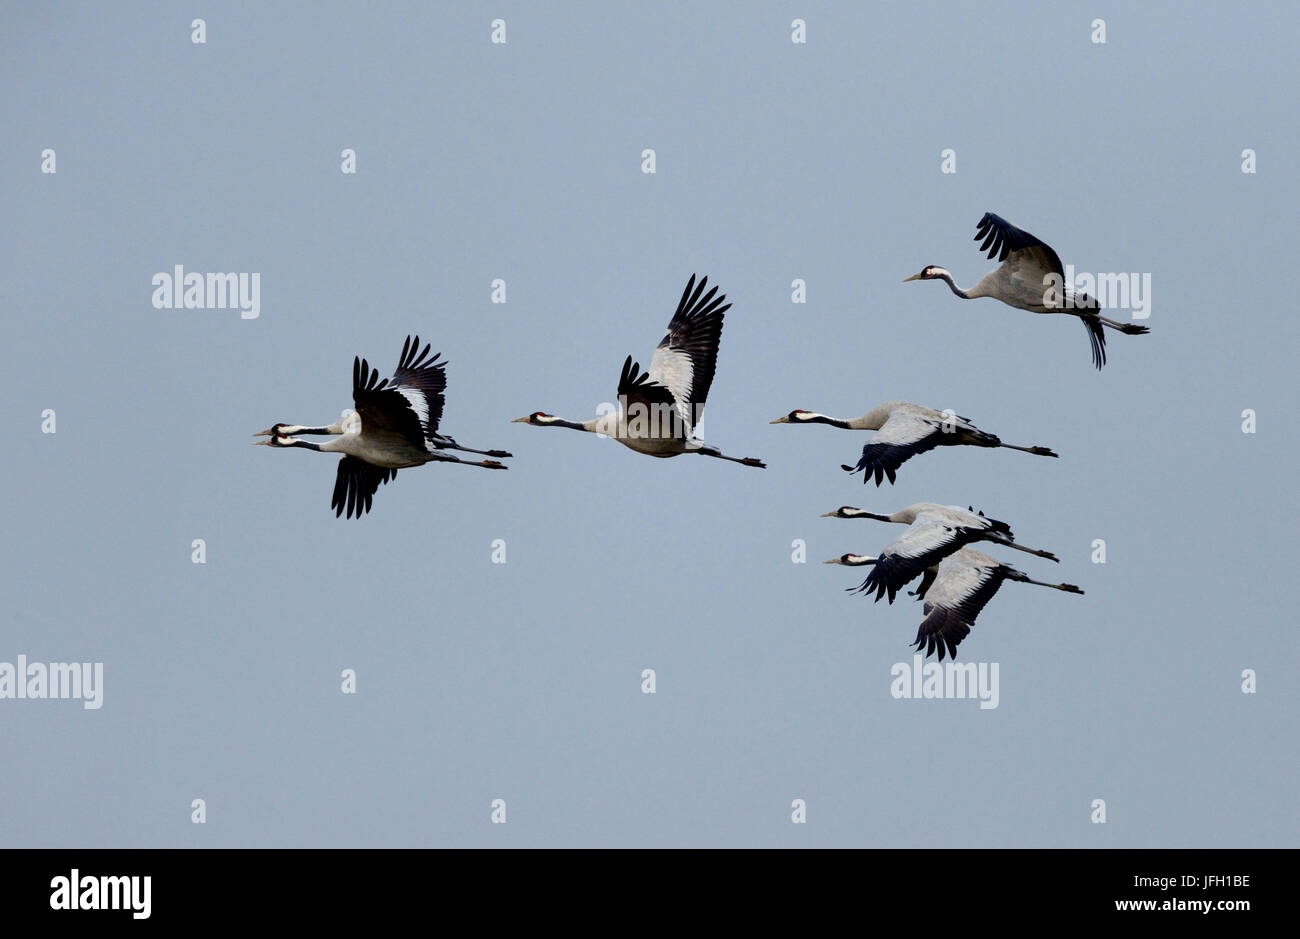 Grey cranes, slack slack, fly, - Stock Image